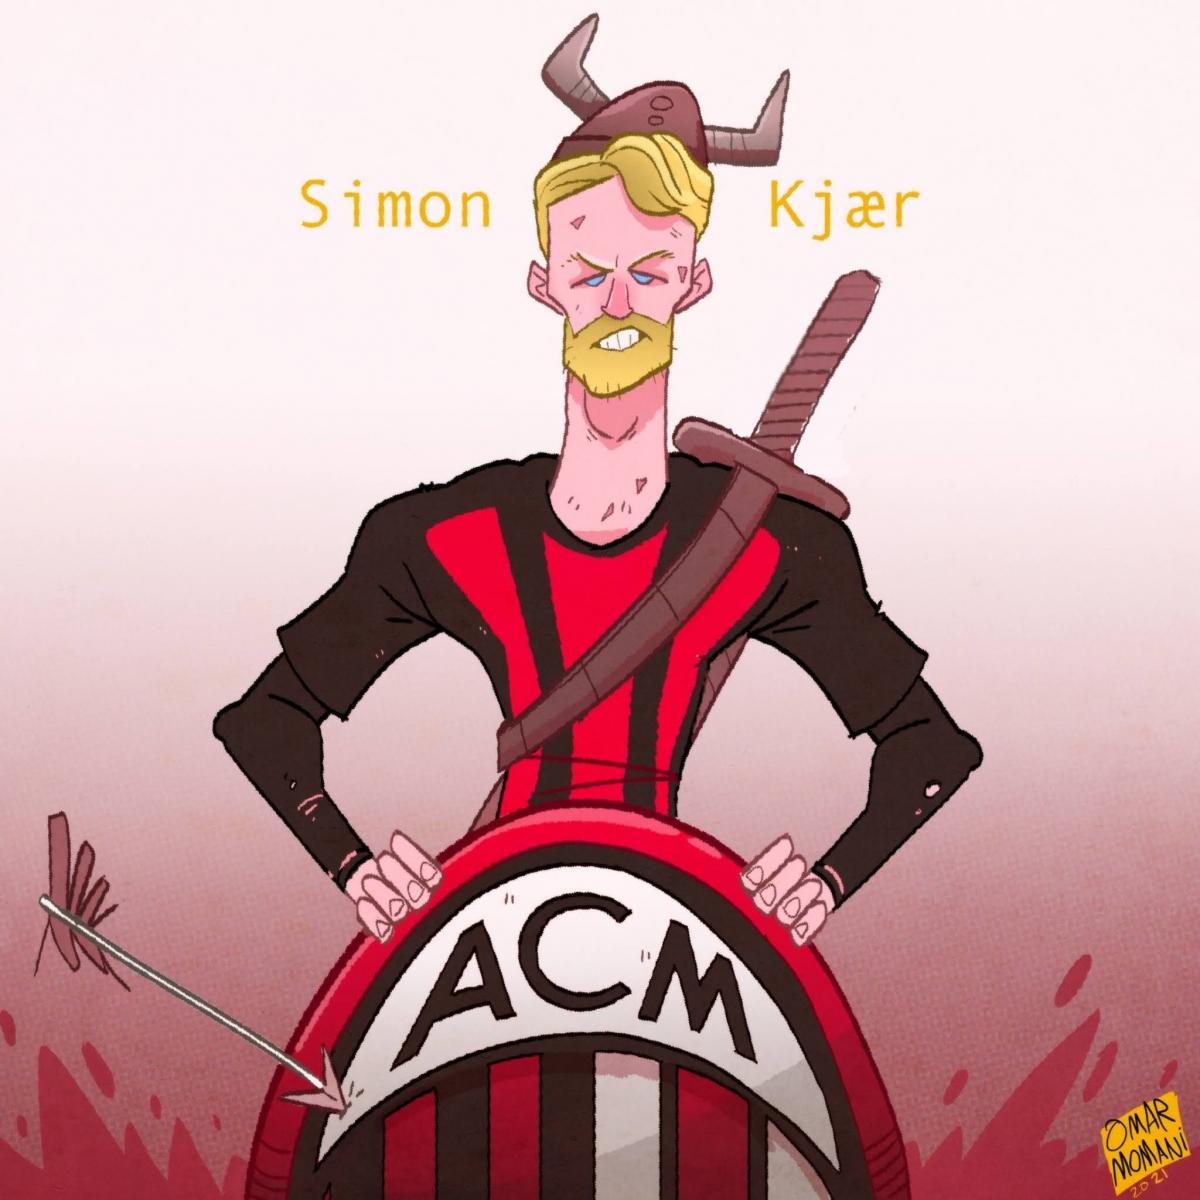 Chiến binh Simo Kjaer. (Ảnh: Omar Momani)